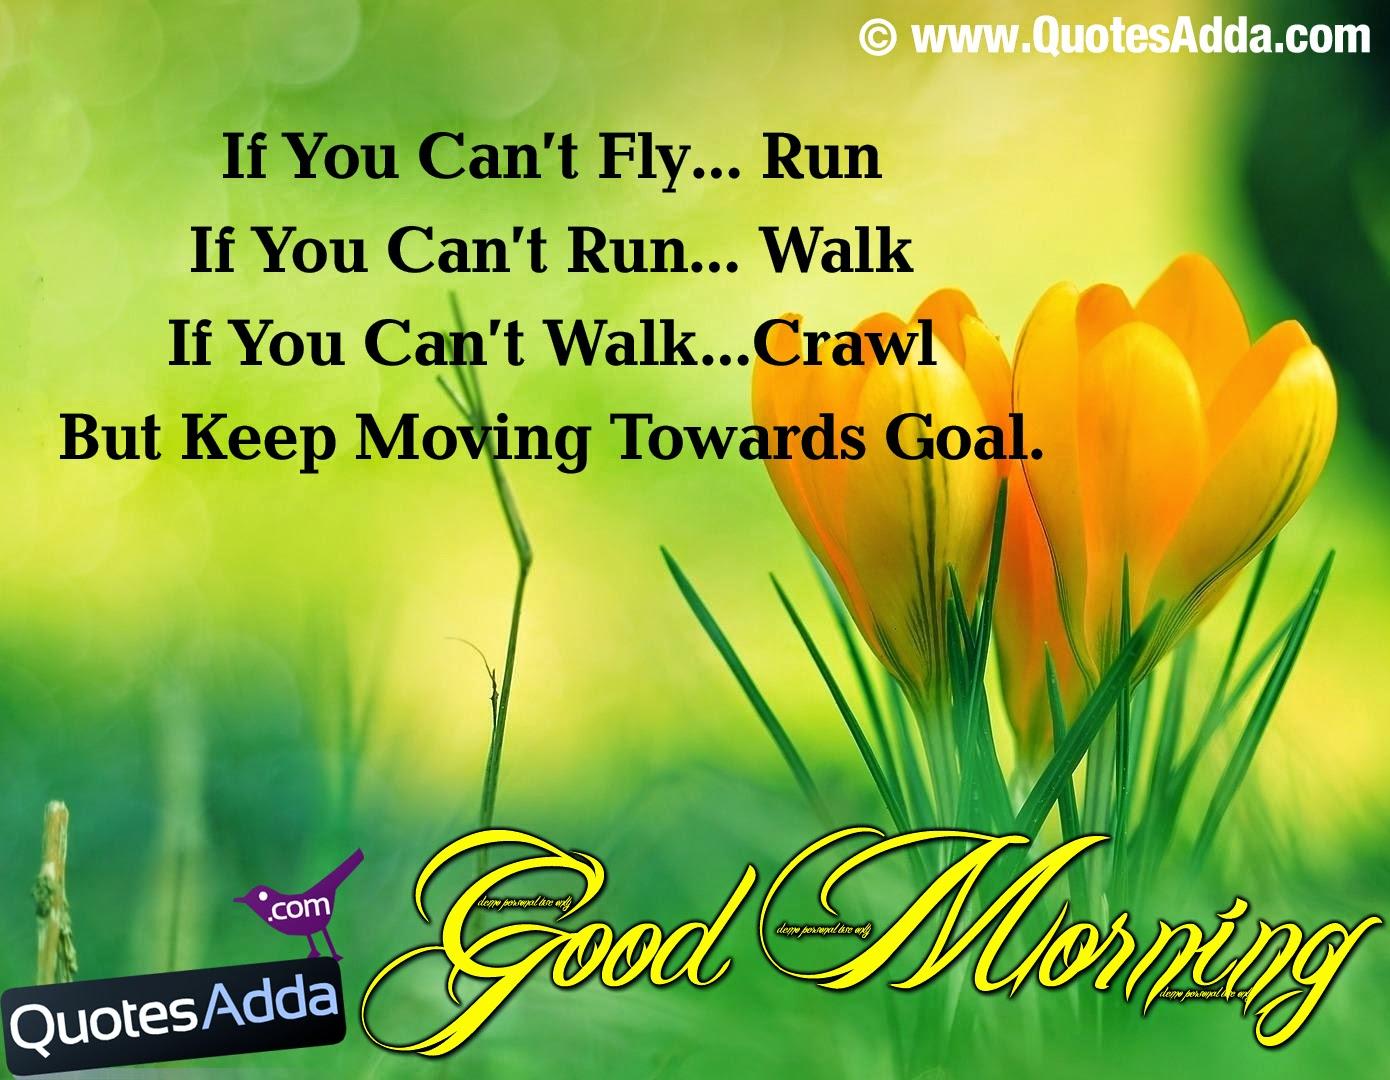 Good Morning Quotes For Him Quotesgram: Sad Quotes Good Morning. QuotesGram